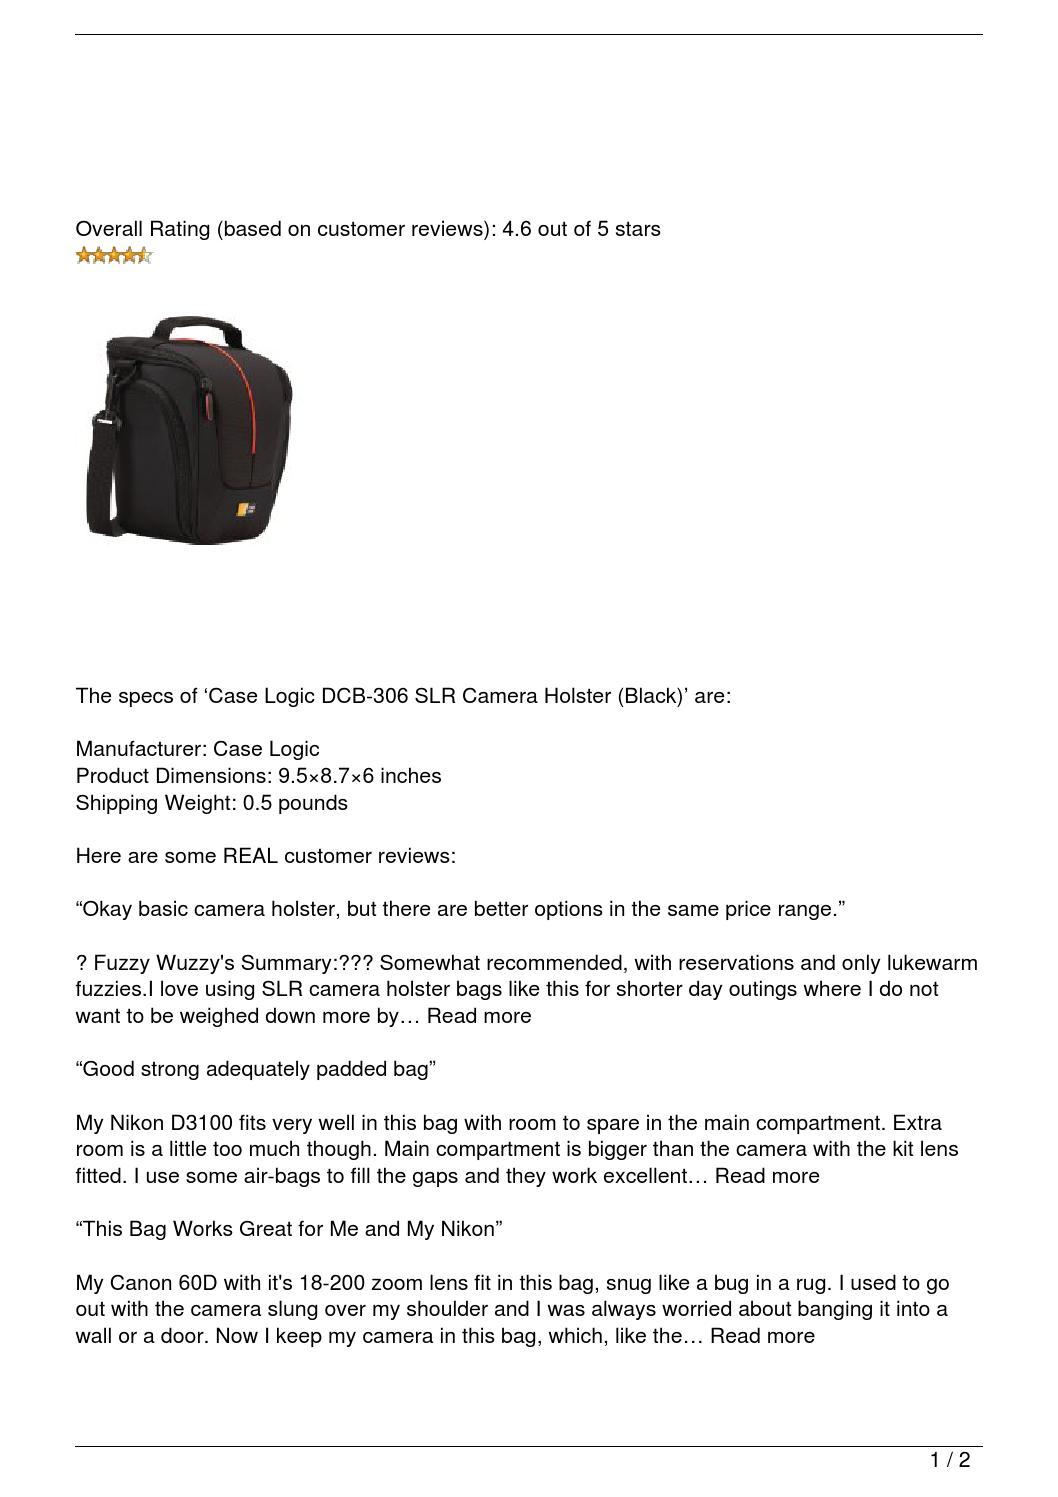 Case Logic DCB-306 SLR Camera Holster (Black) Review by Jeff